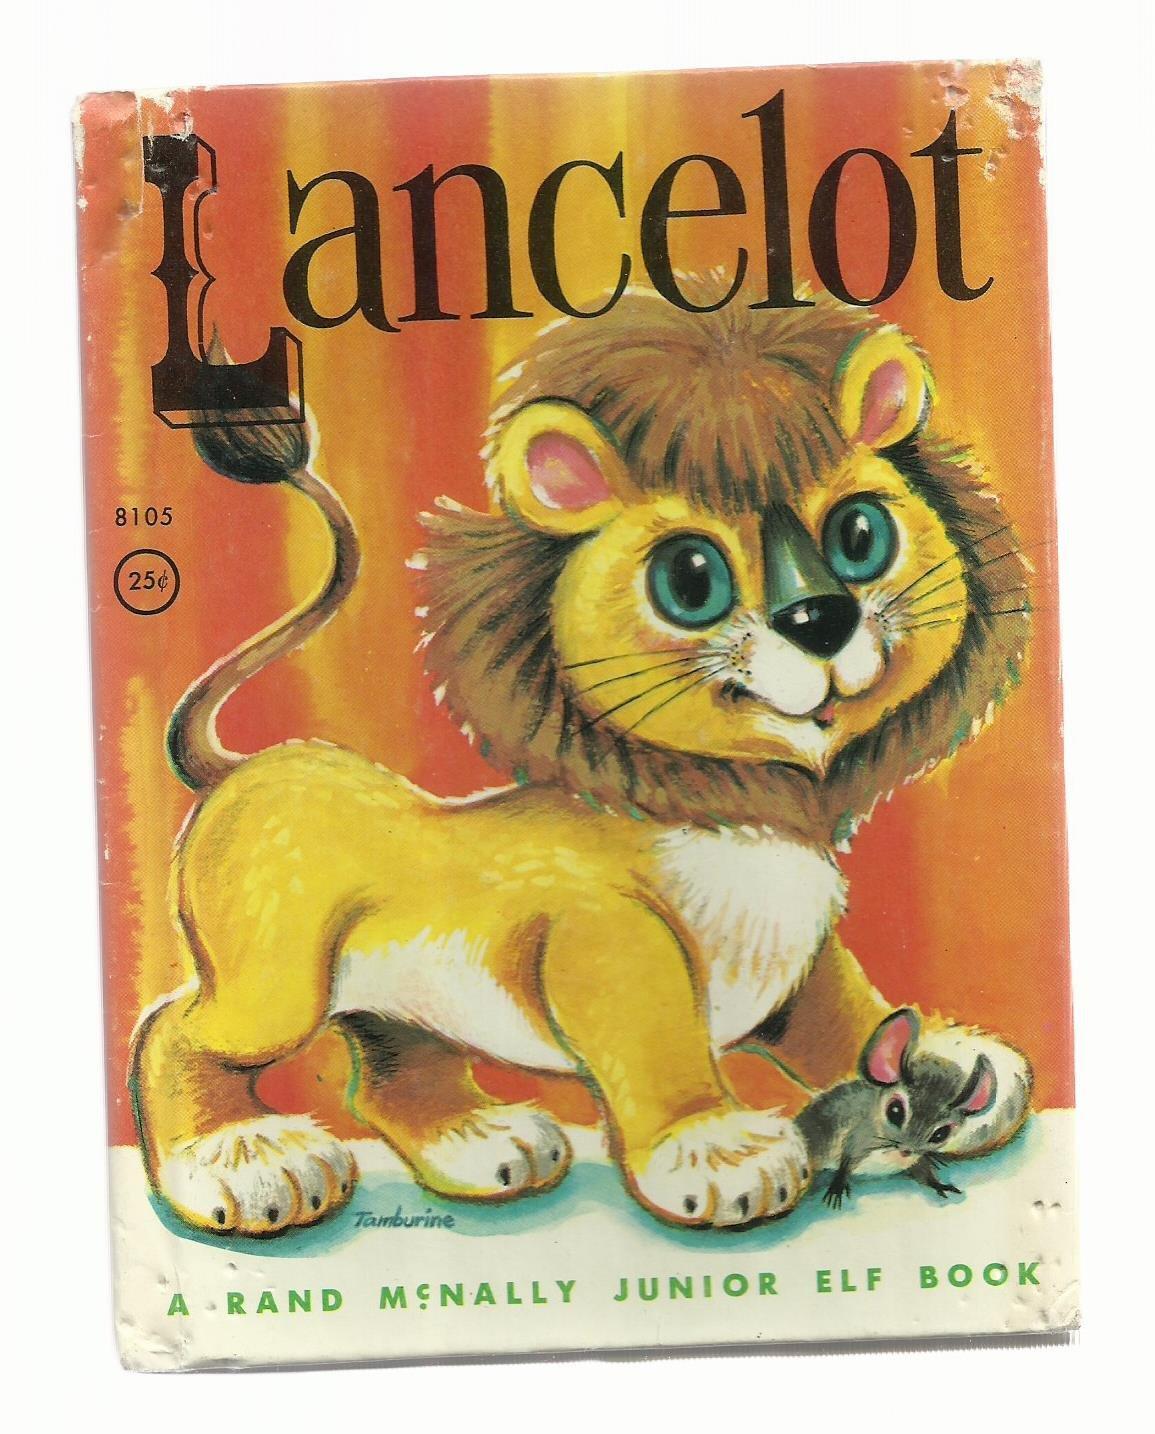 Lancelot, 1963 A Vintage Rand McNally Junior Elf Children's Book